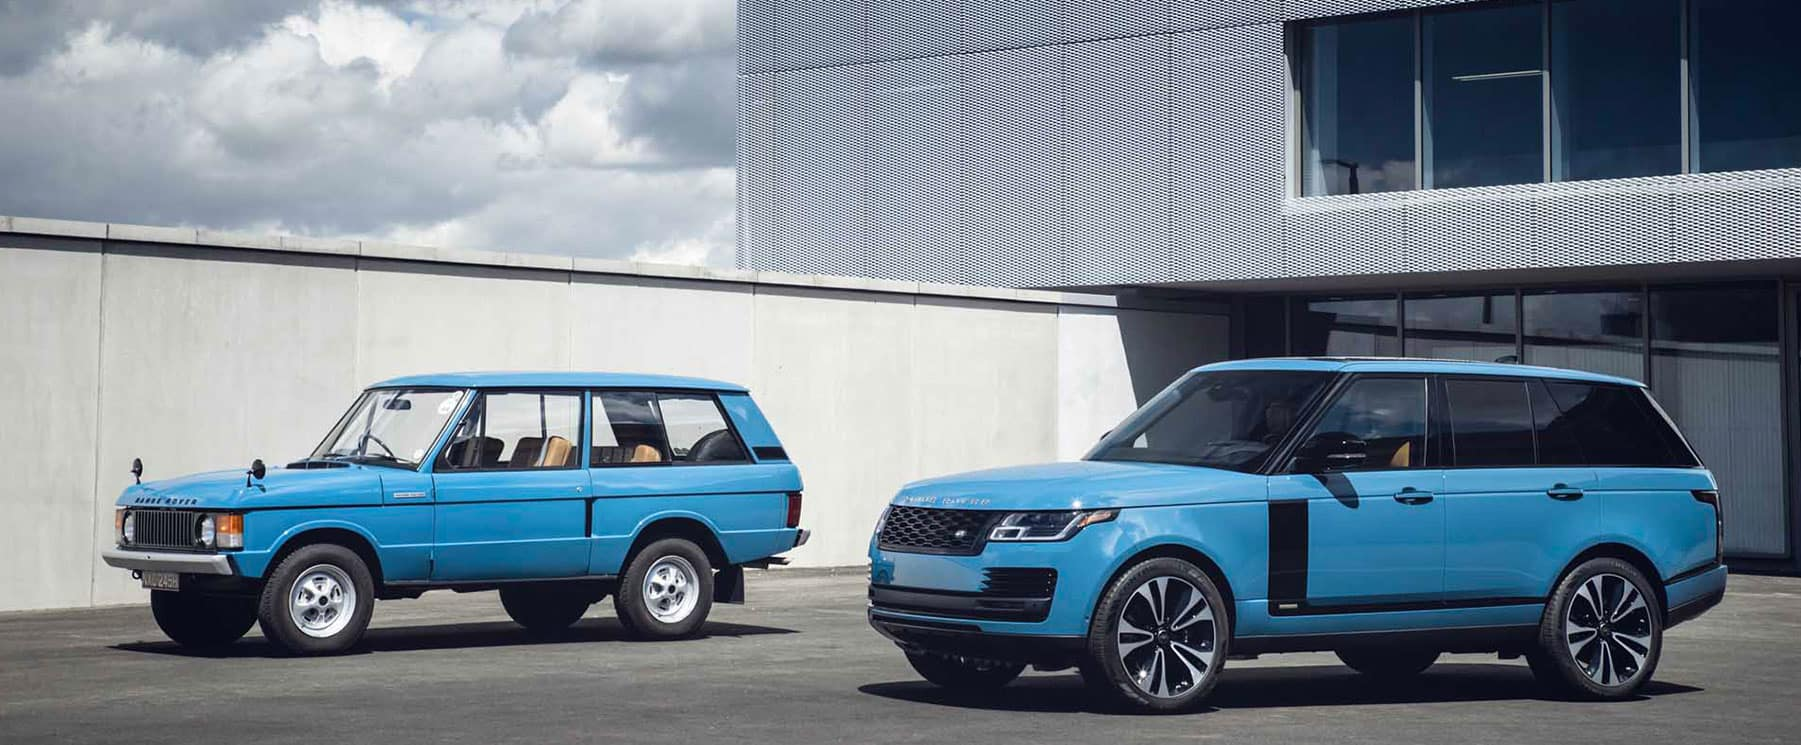 2020 Land Rover Range Rover Velar Model Overview at Land Rover Louisville